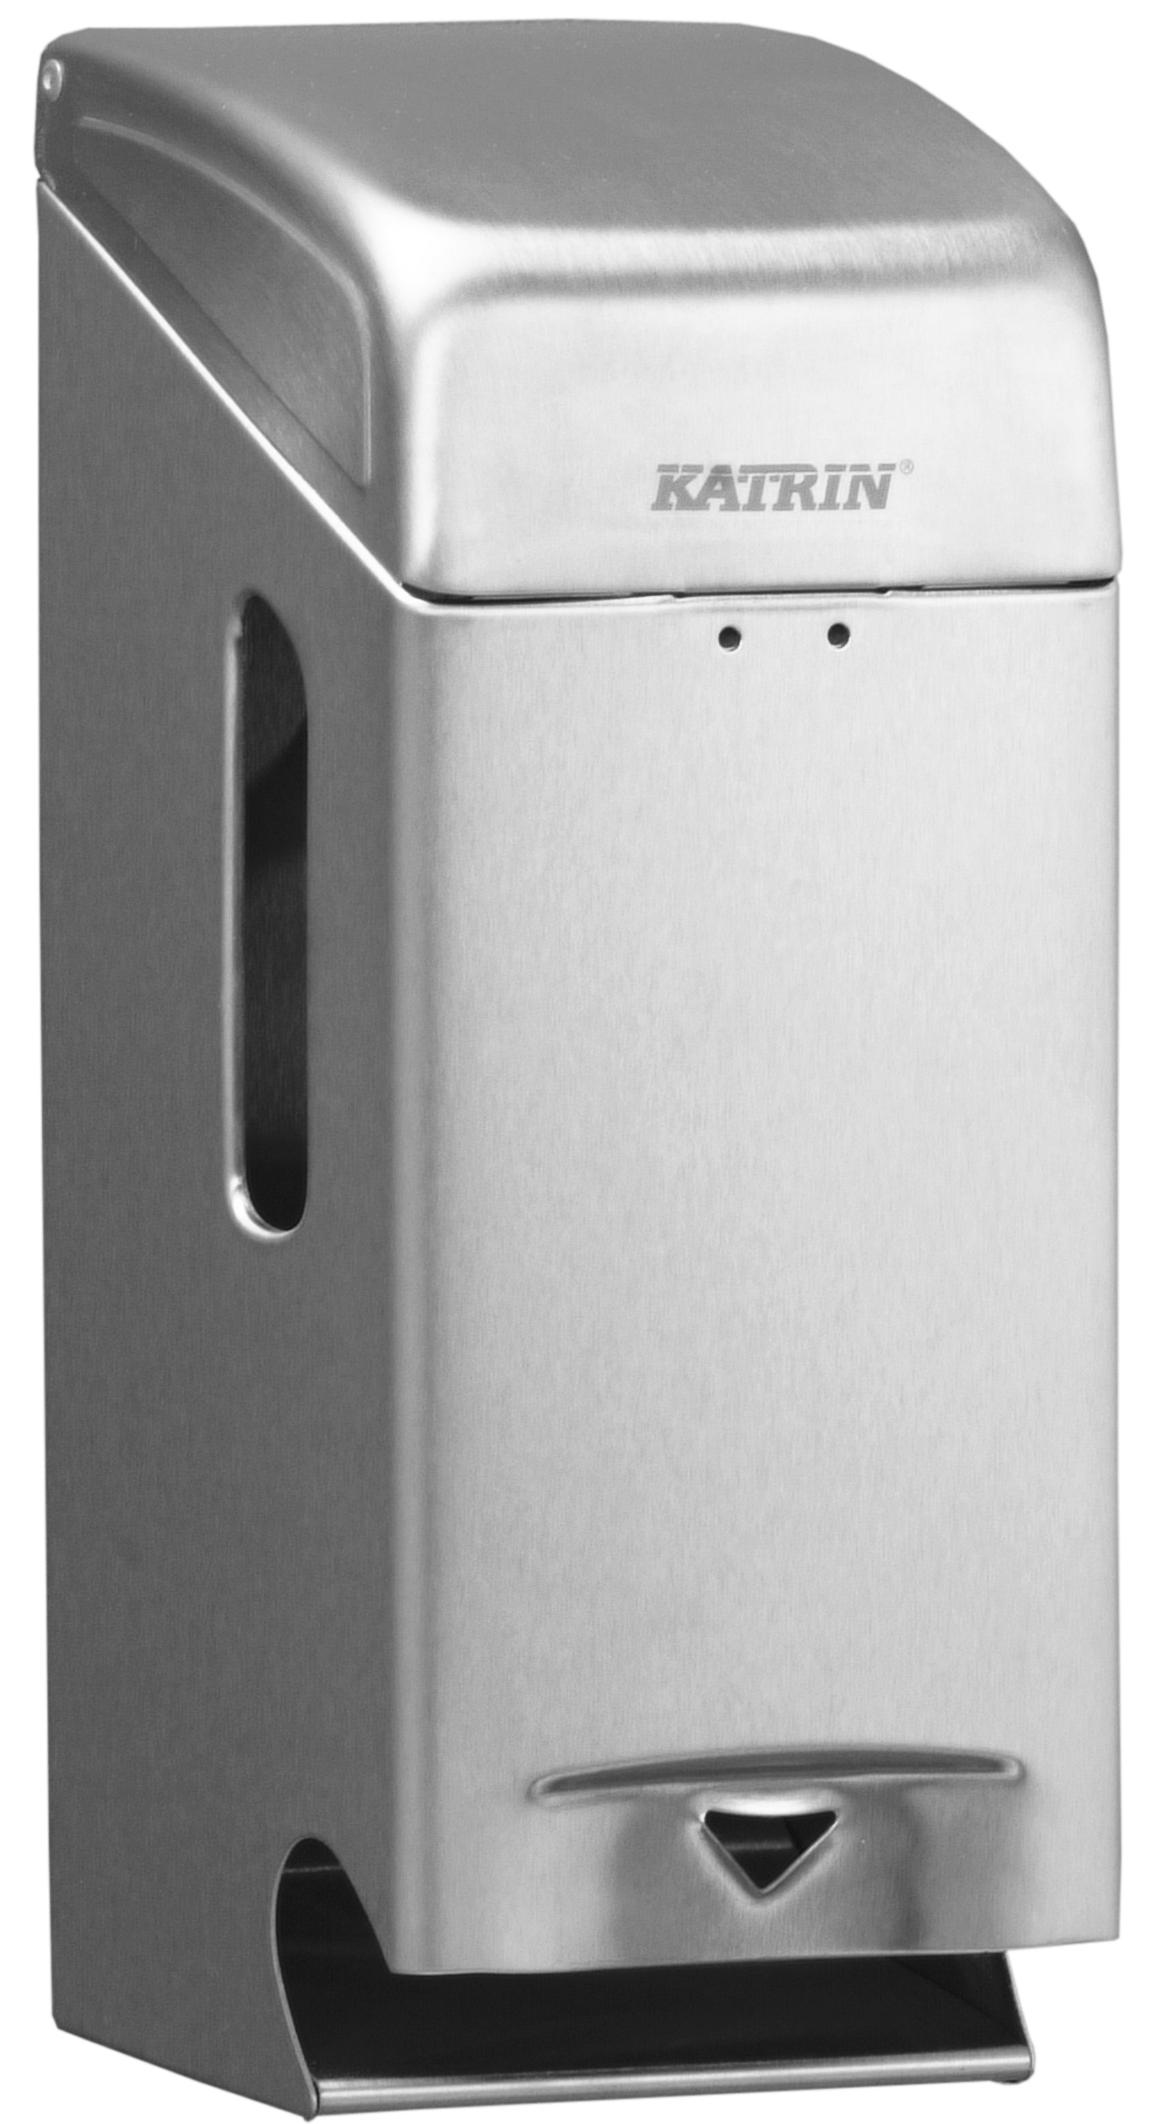 Katrin Toilettenpapierspender Toilett 2-Roll stahl